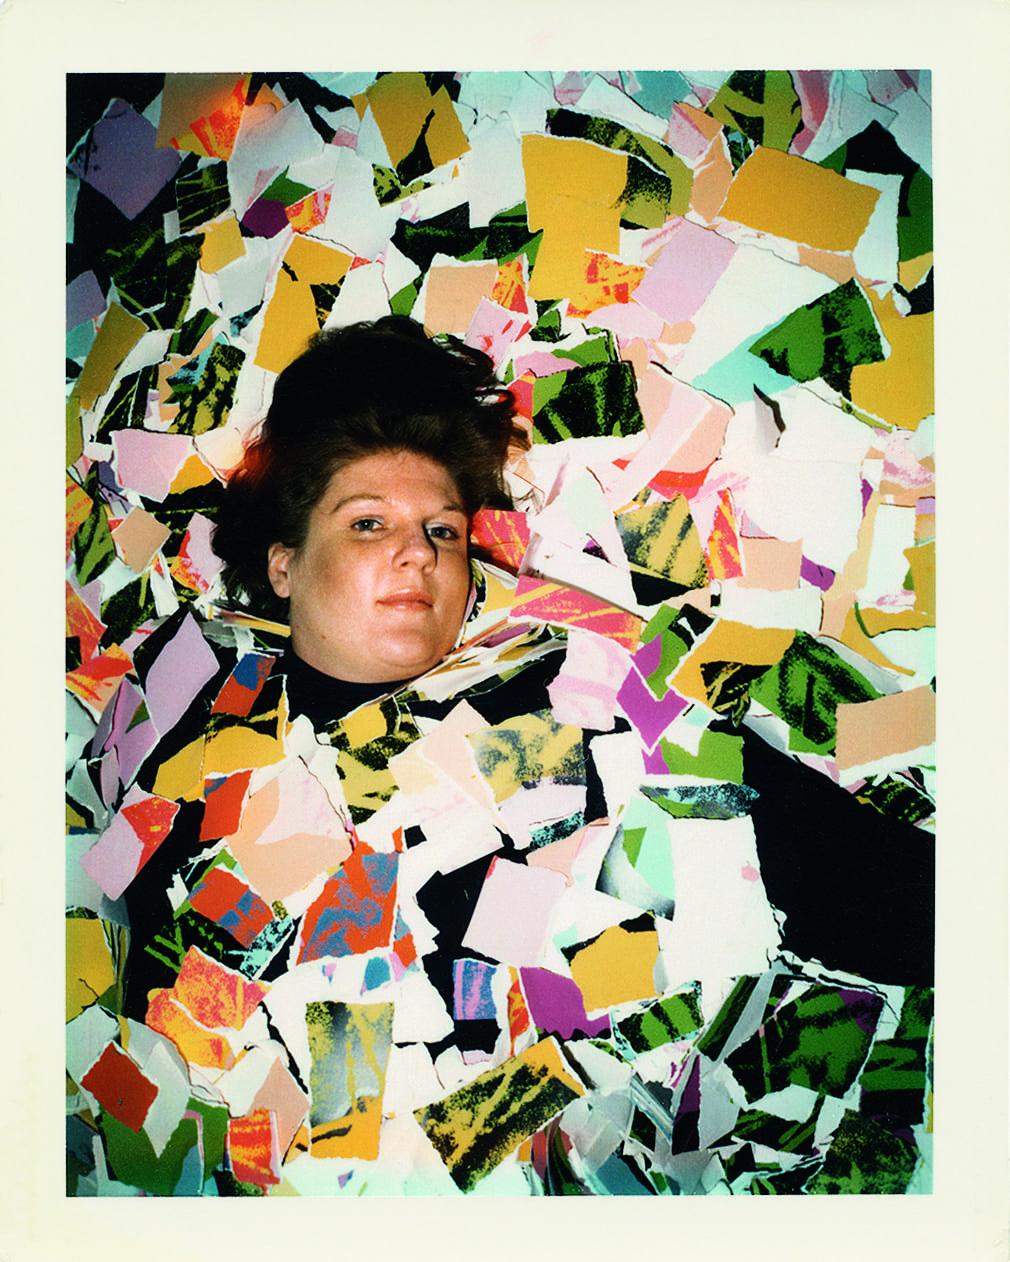 Brigid Berlin self-portrait